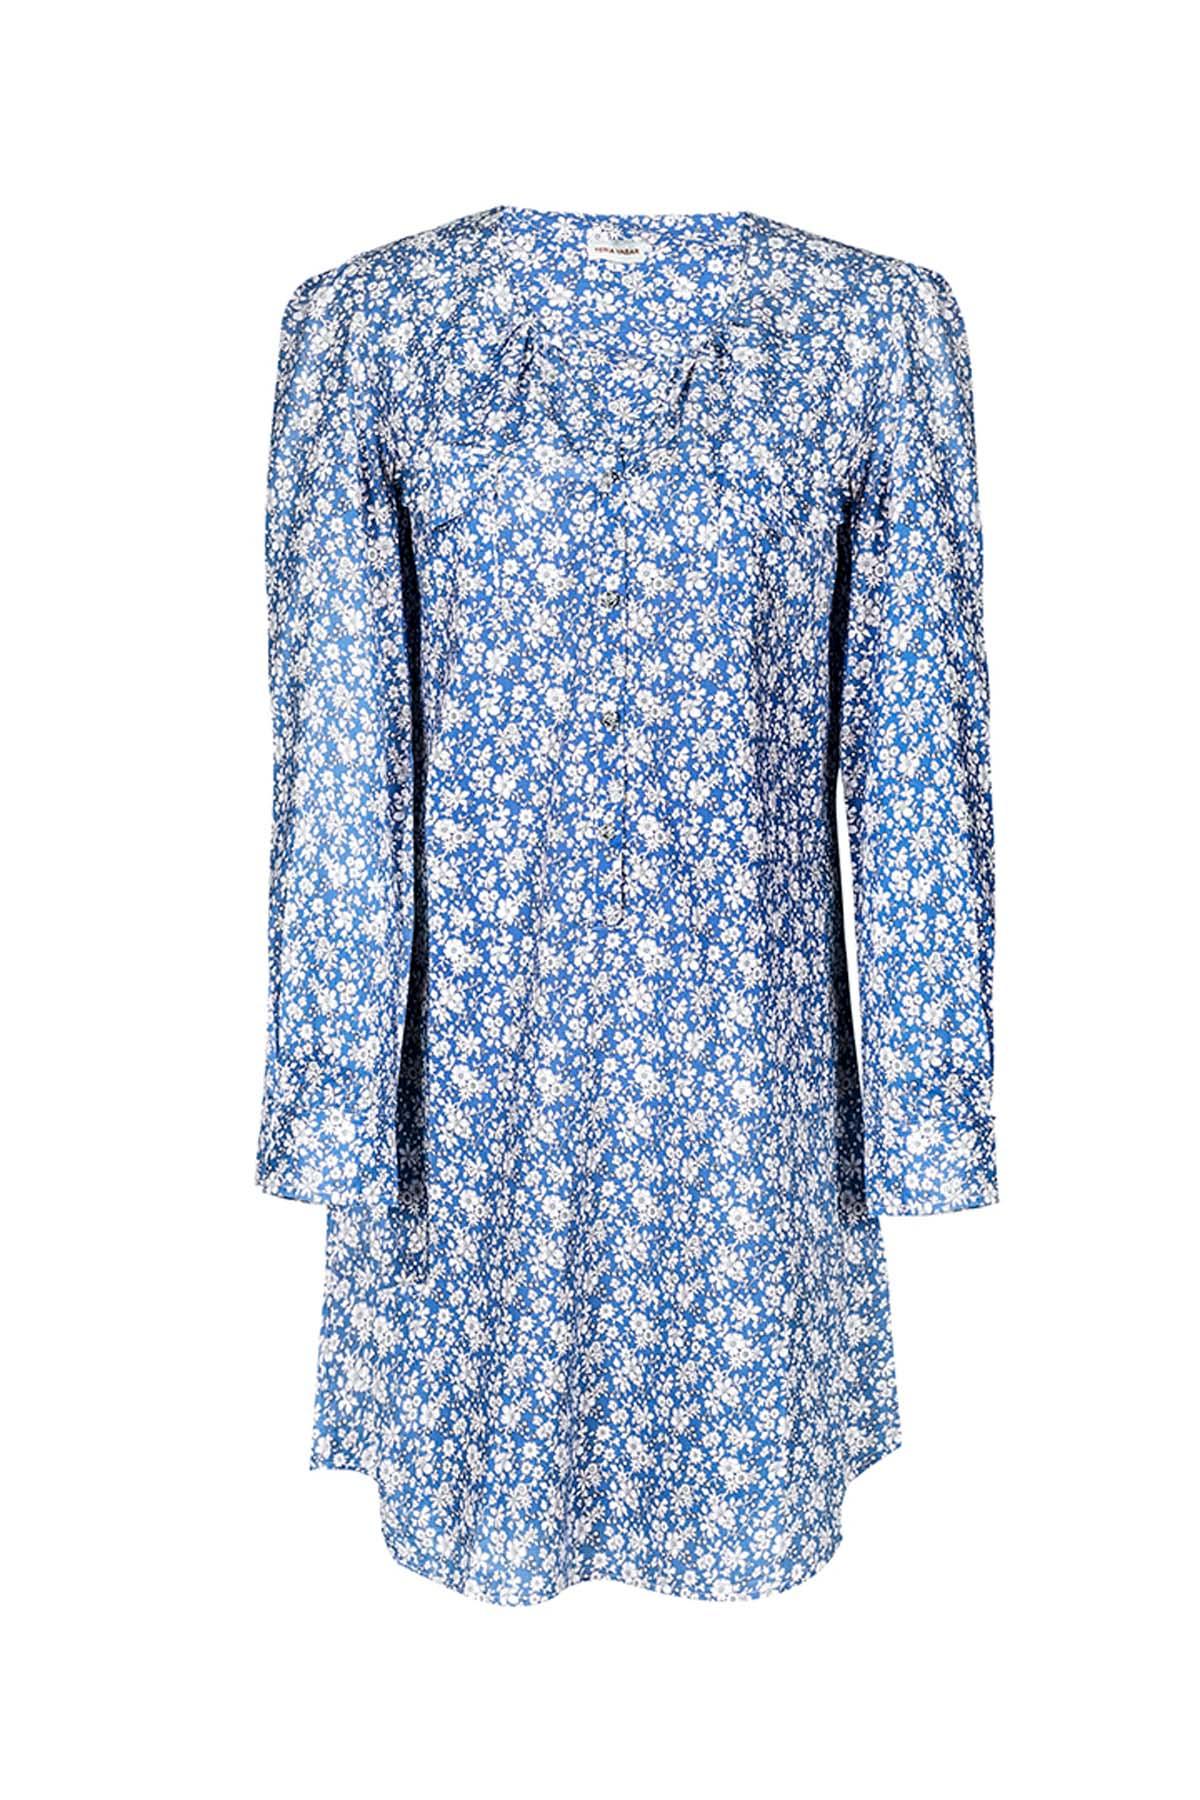 Teria Yabar - Vestido camisero azul Liberty